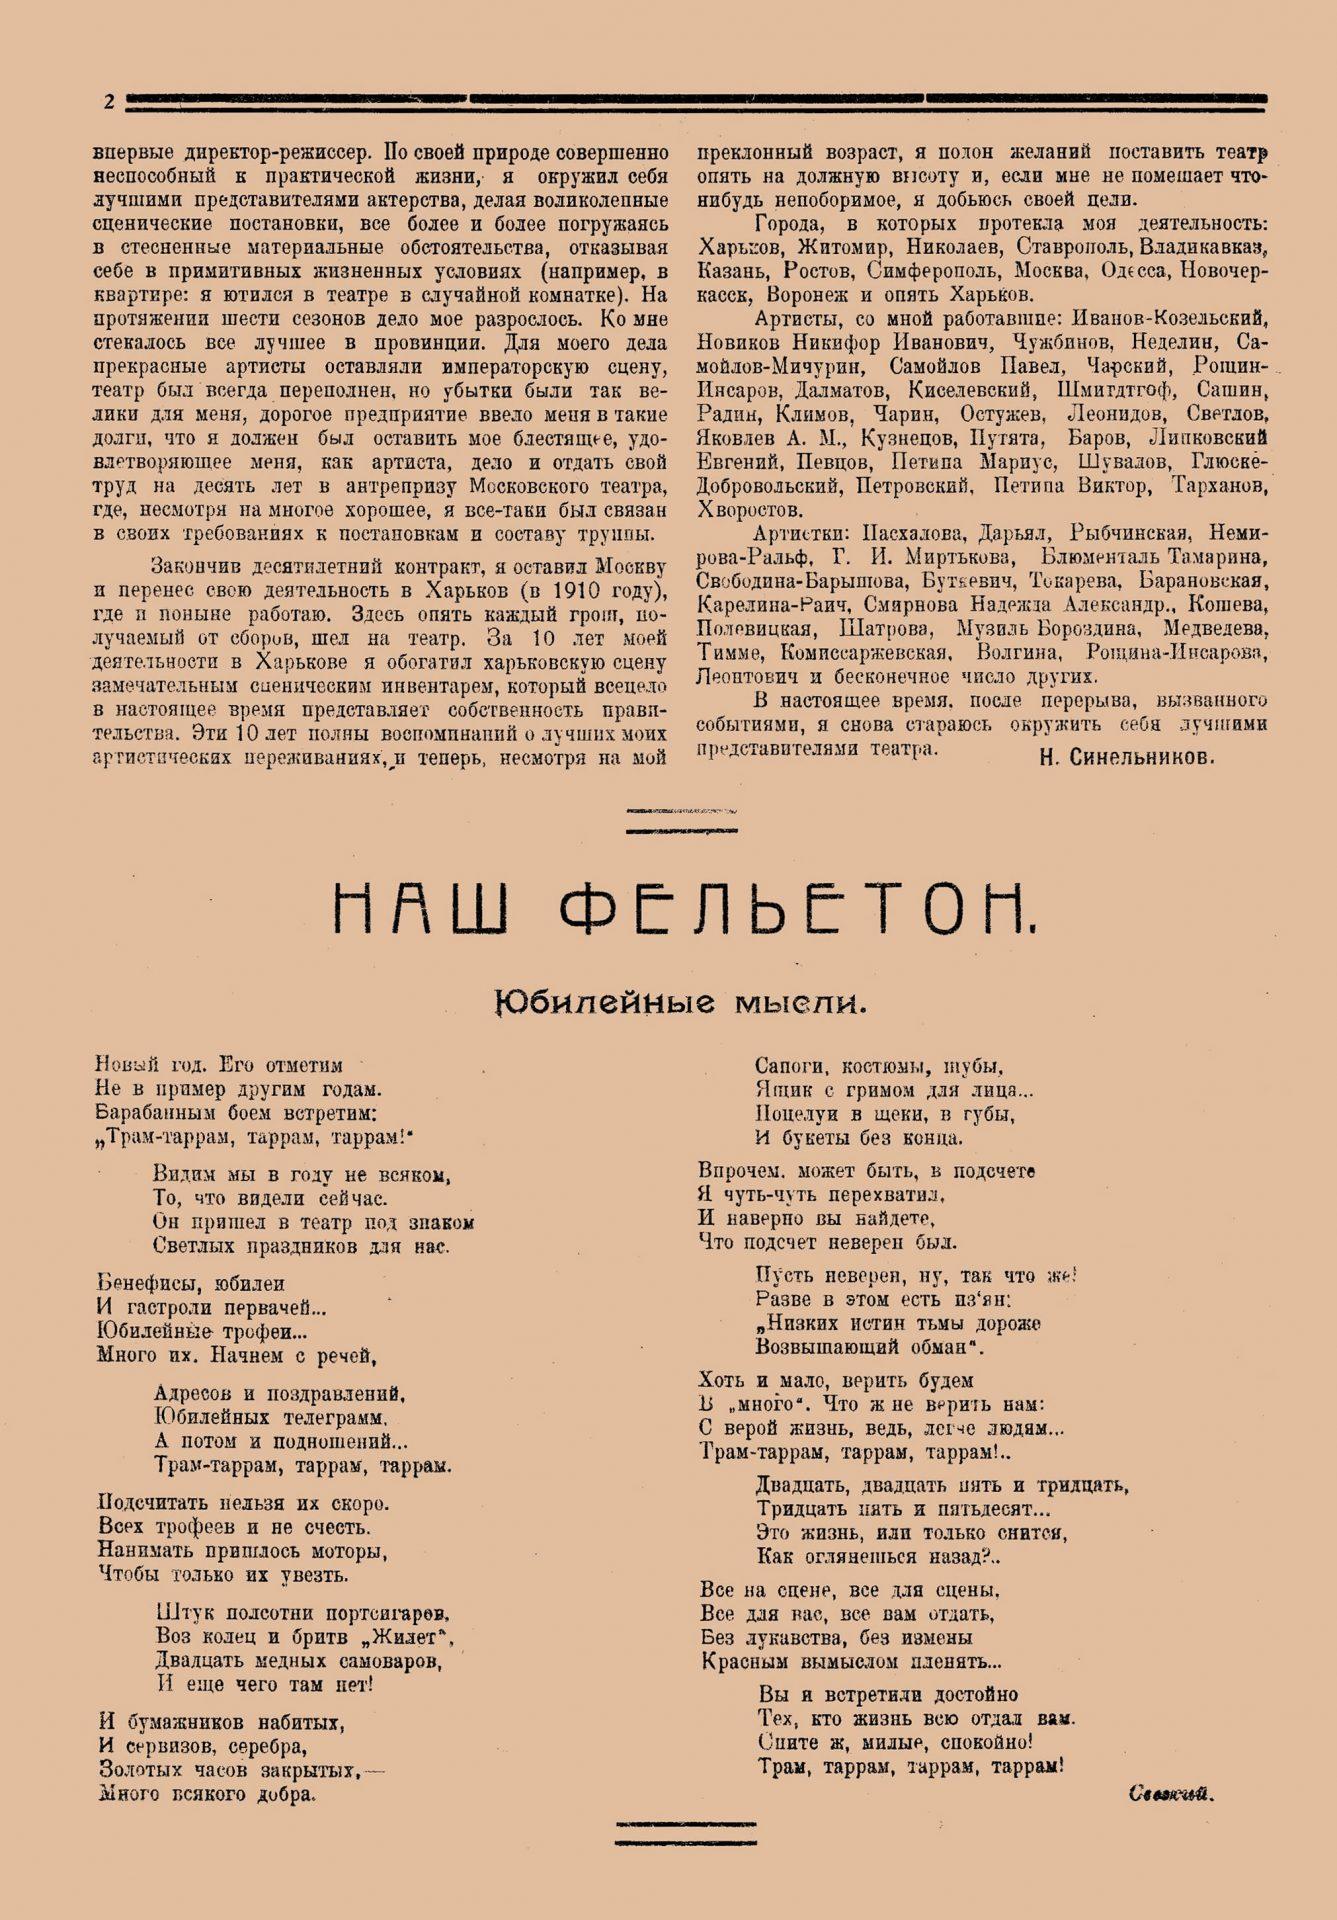 Худож.жизнь_1923_№1